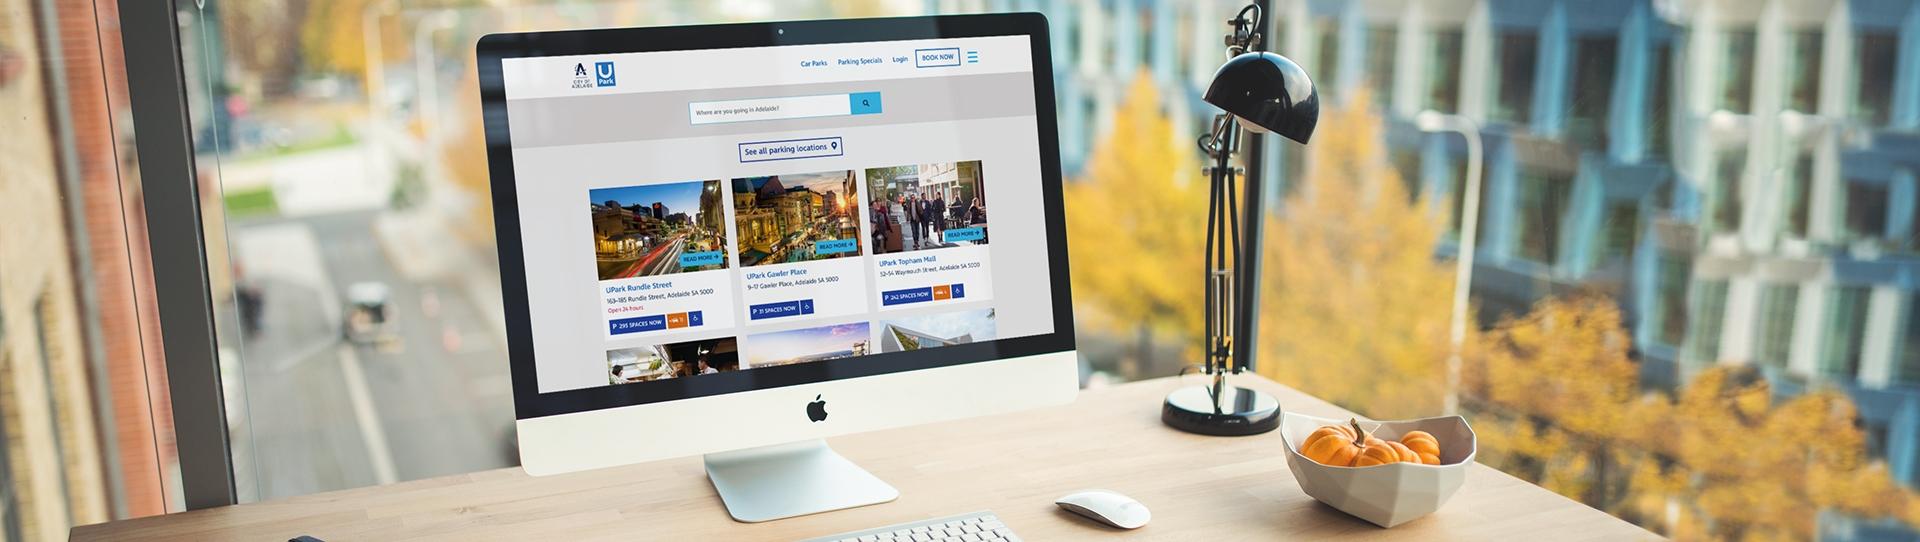 UPark Responsive Web Design